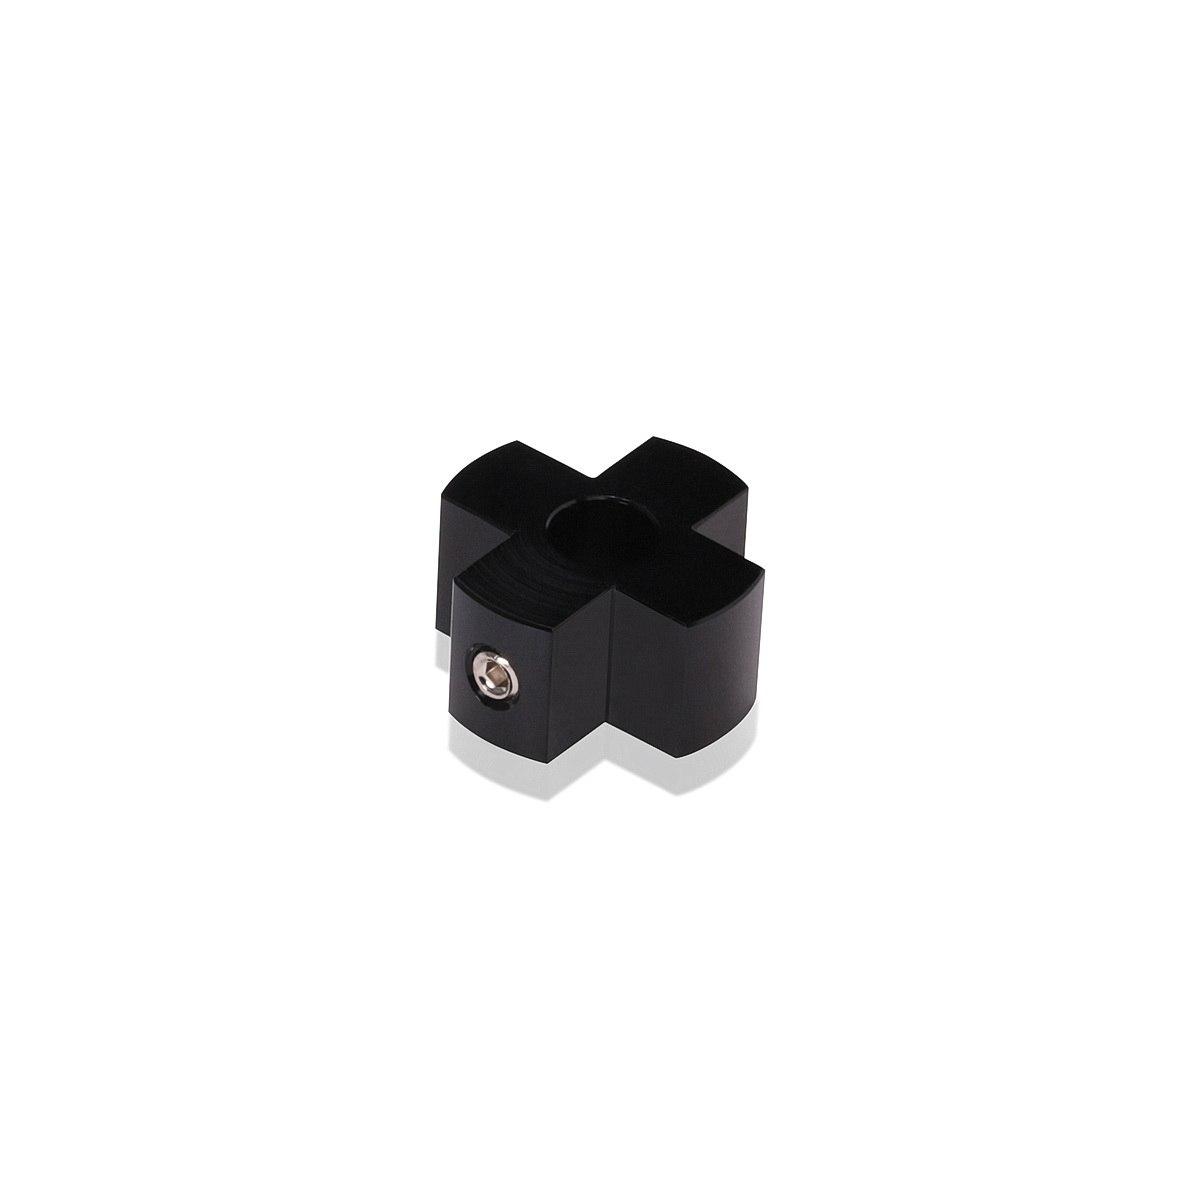 4-Way Standoffs Hub, Diameter: 1'', Thickness: 1/2'', Black Anodized Aluminum